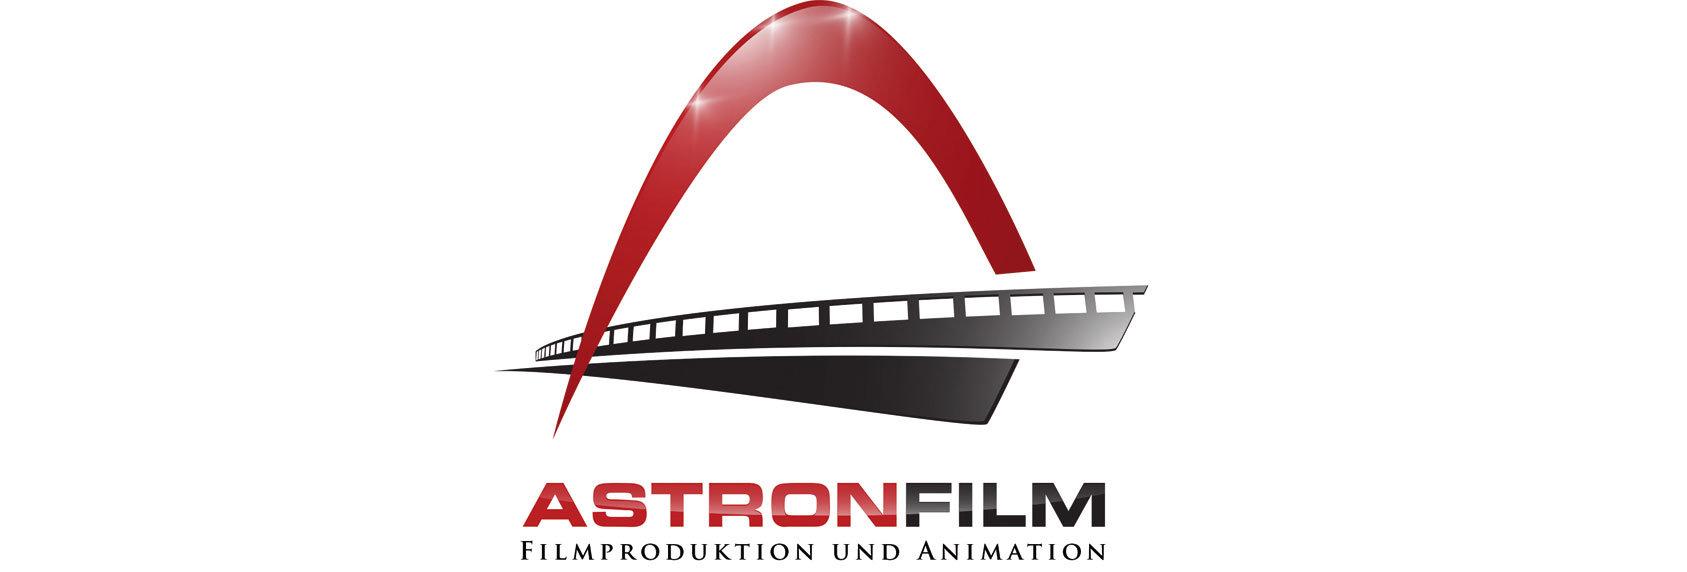 Astronfilm